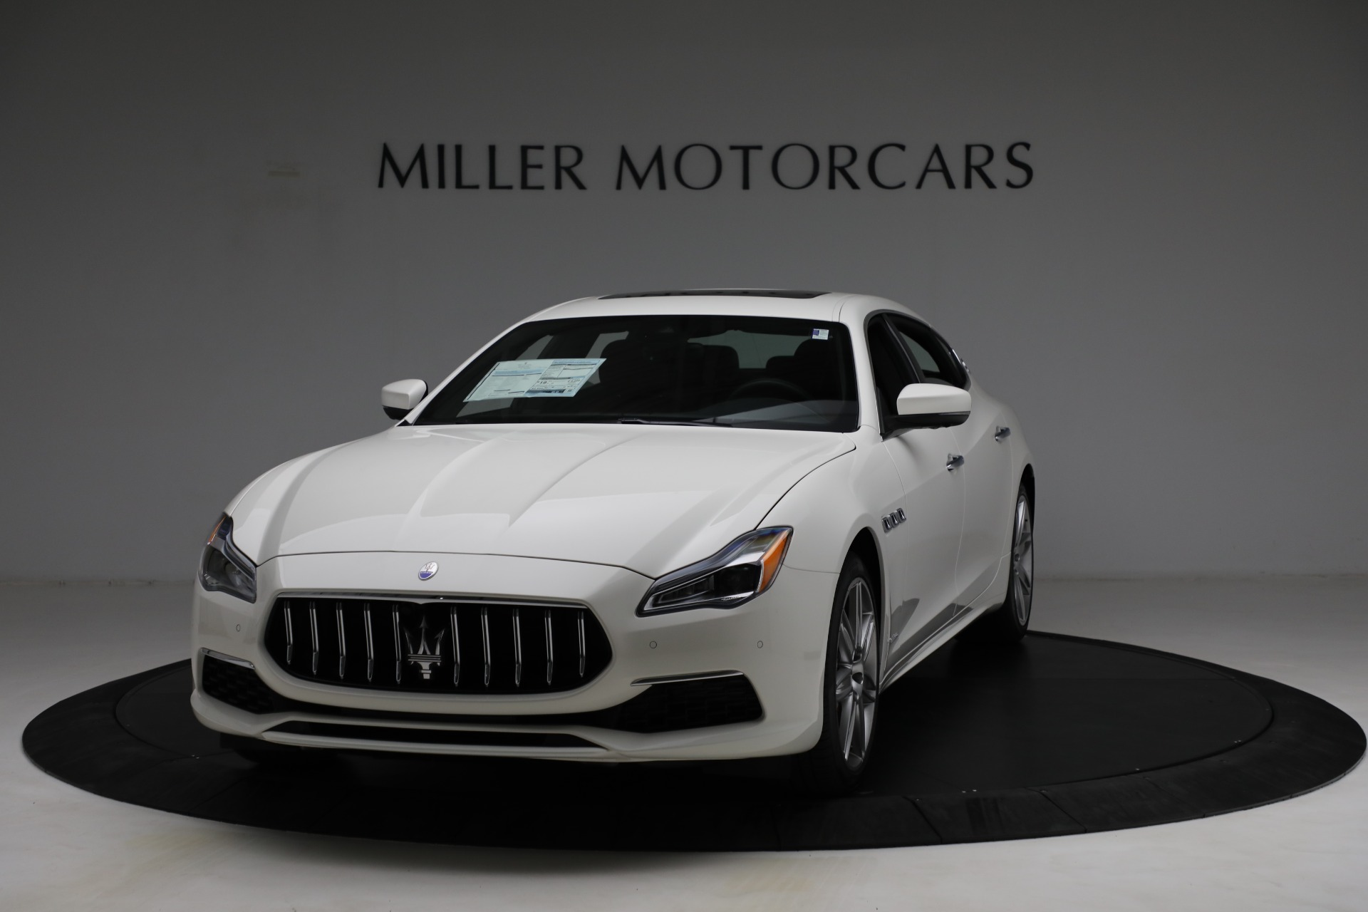 New 2021 Maserati Quattroporte S Q4 GranLusso for sale $120,599 at Rolls-Royce Motor Cars Greenwich in Greenwich CT 06830 1